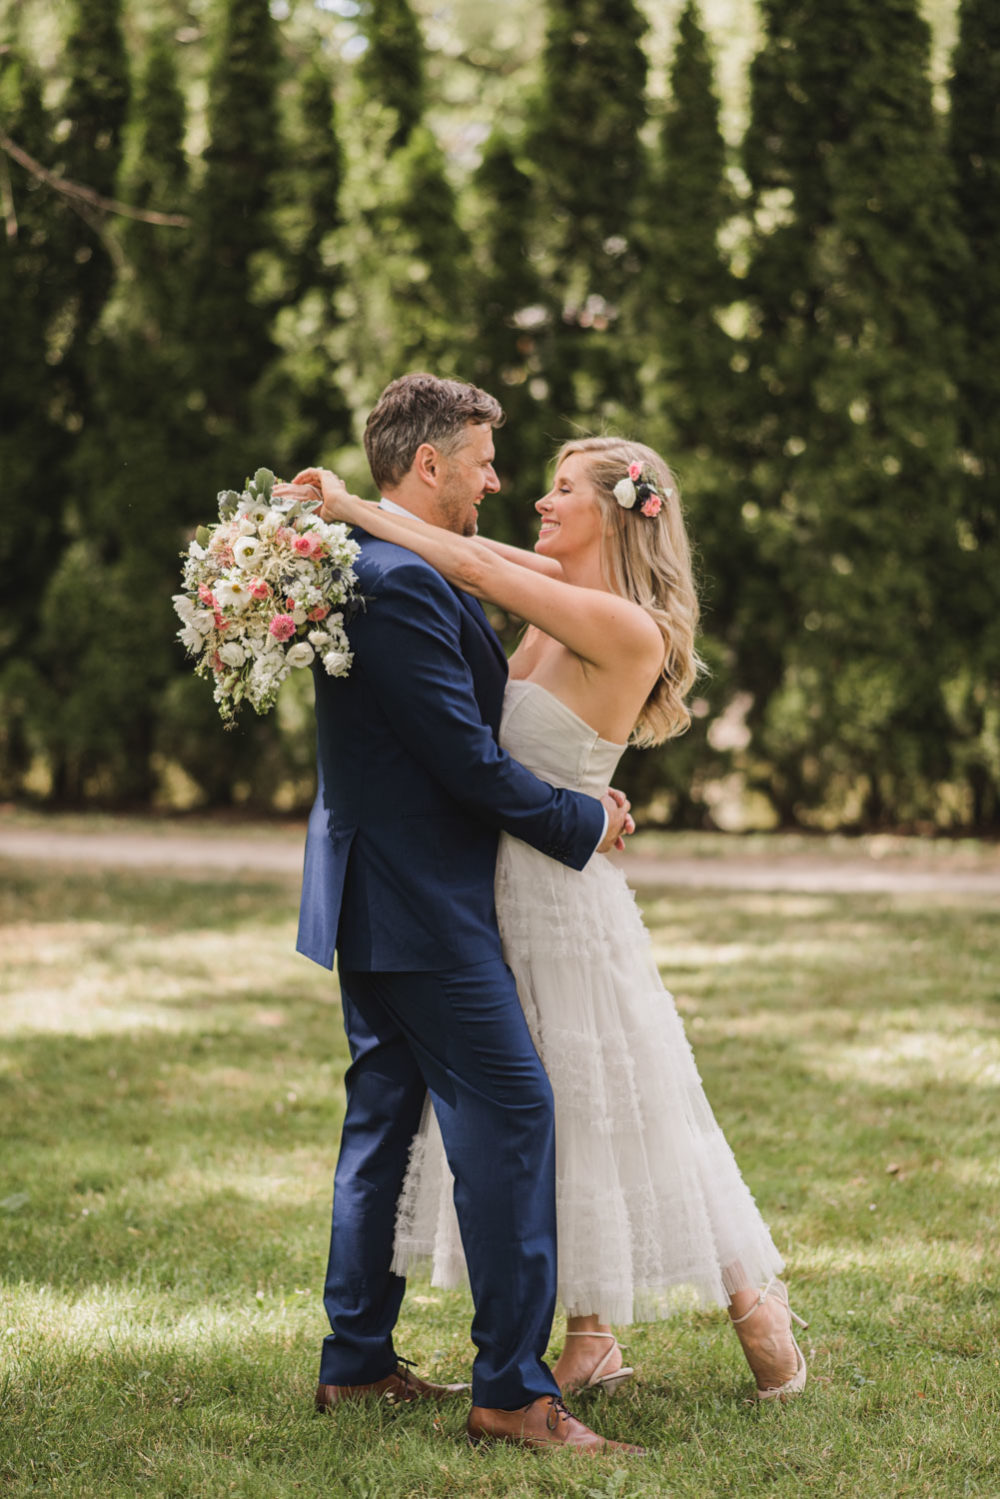 Stratford Elopement Photography Covid Wedding